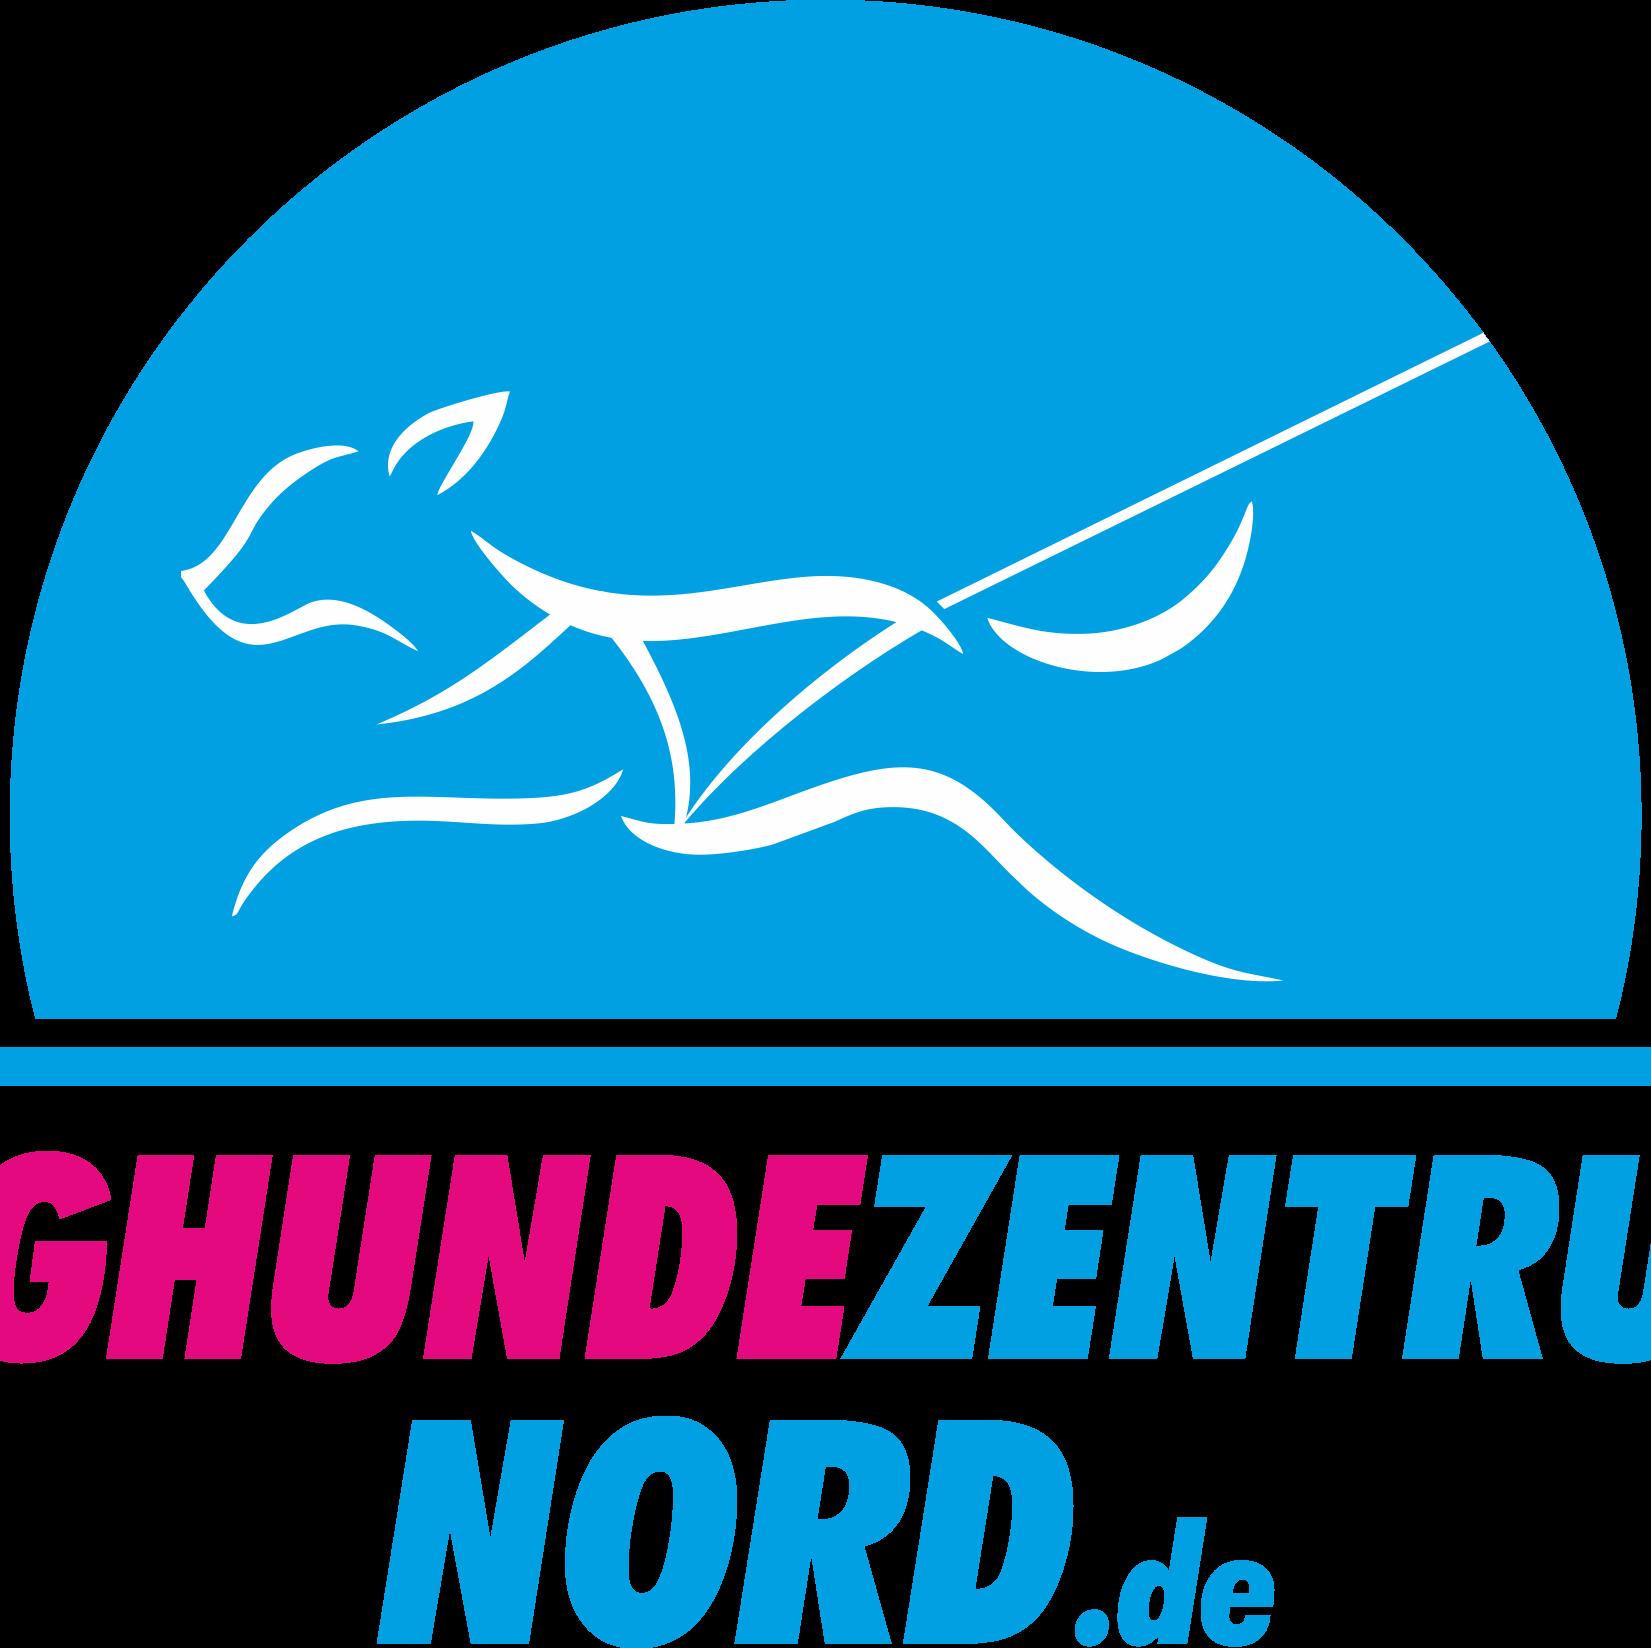 Cropped Png Homepage Ohne Hintergrund 1png Zughundezentrum Nord